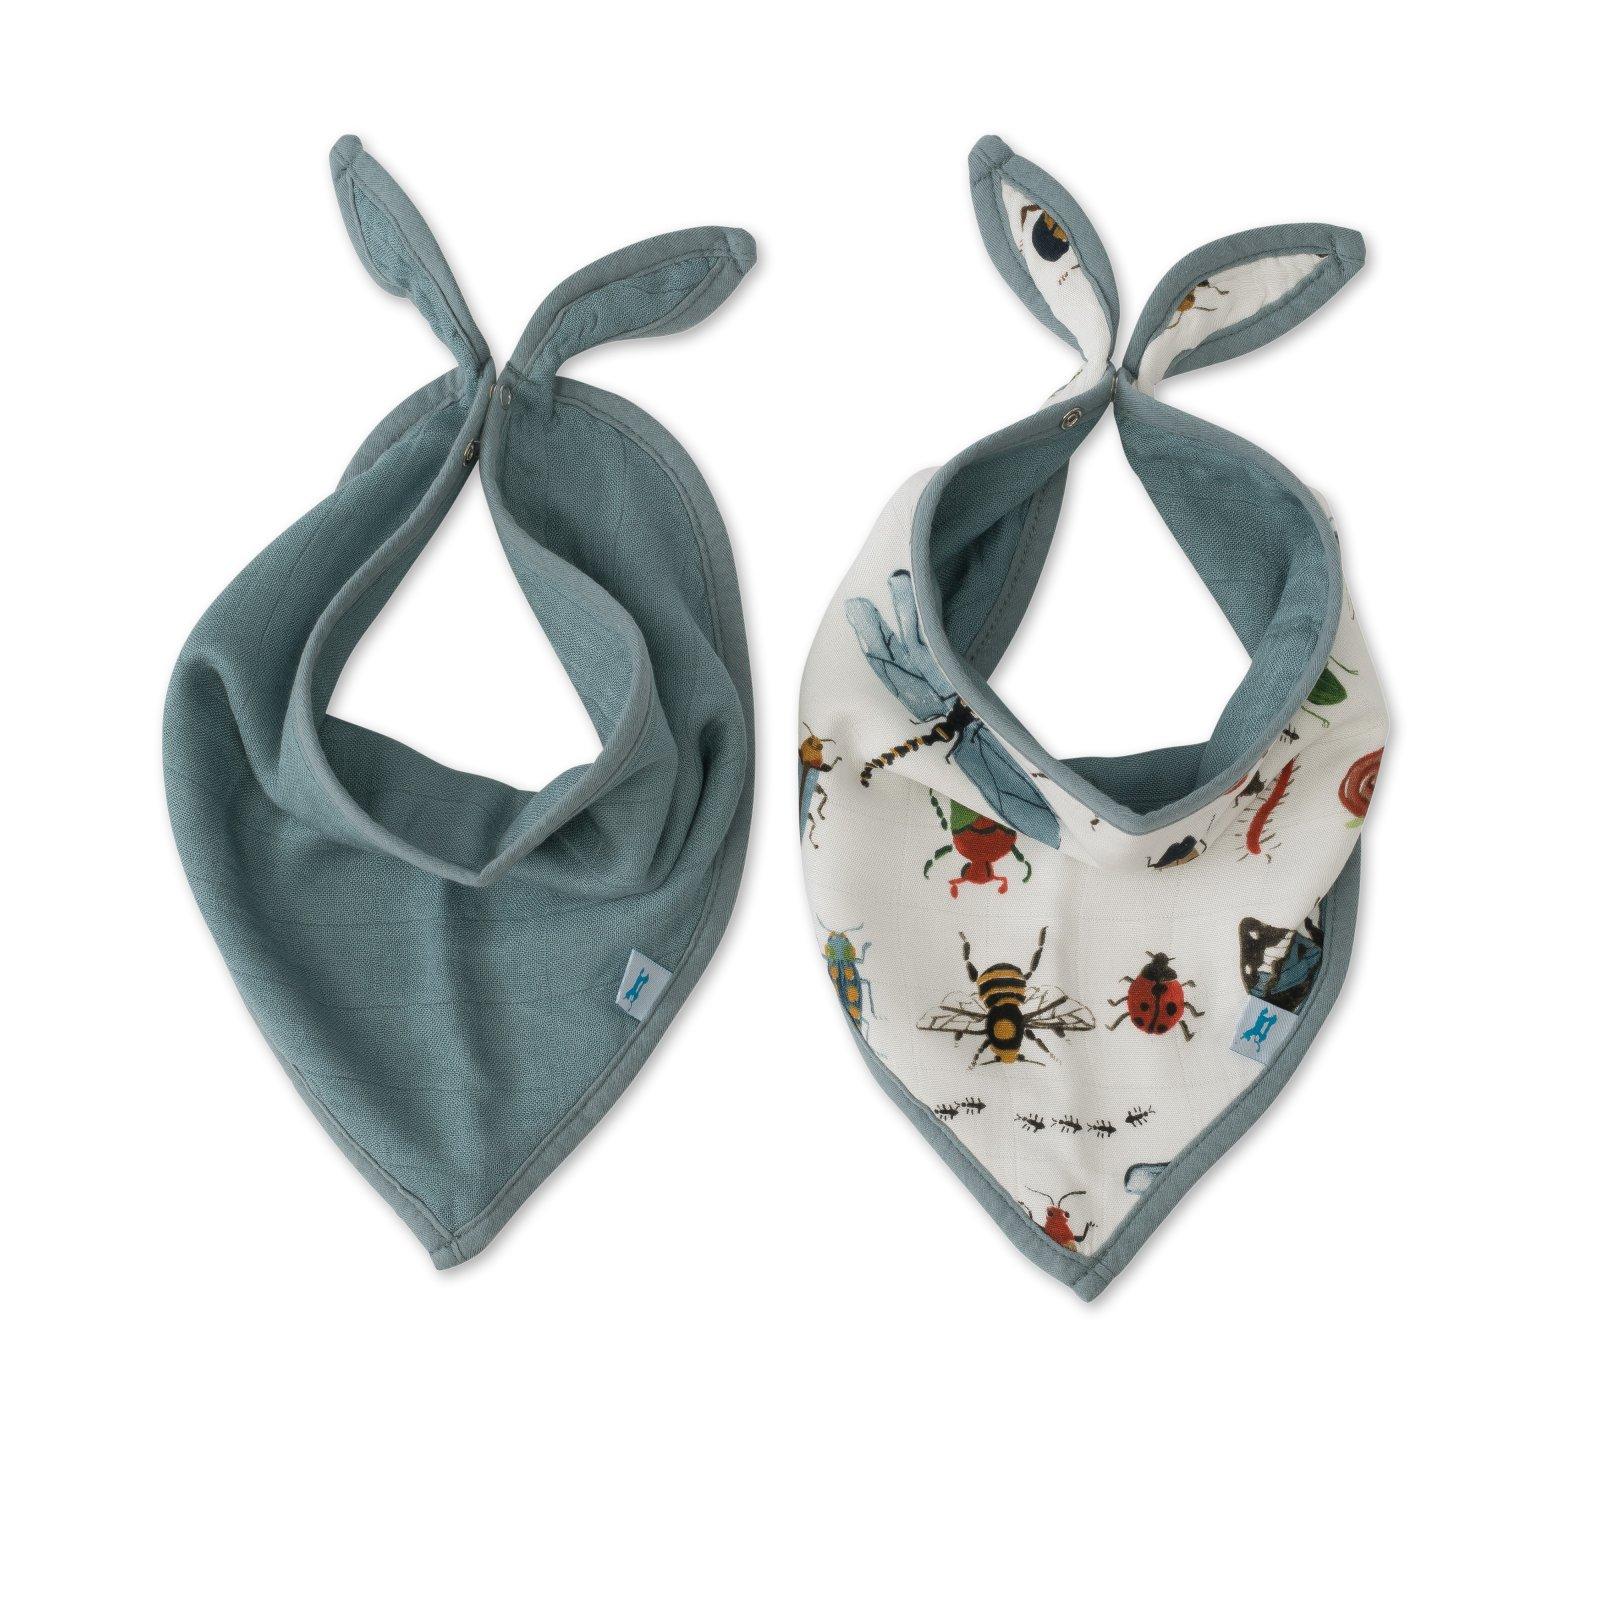 Little Unicorn Deluxe Muslin Bandana Bib 2 Pack - Bugs